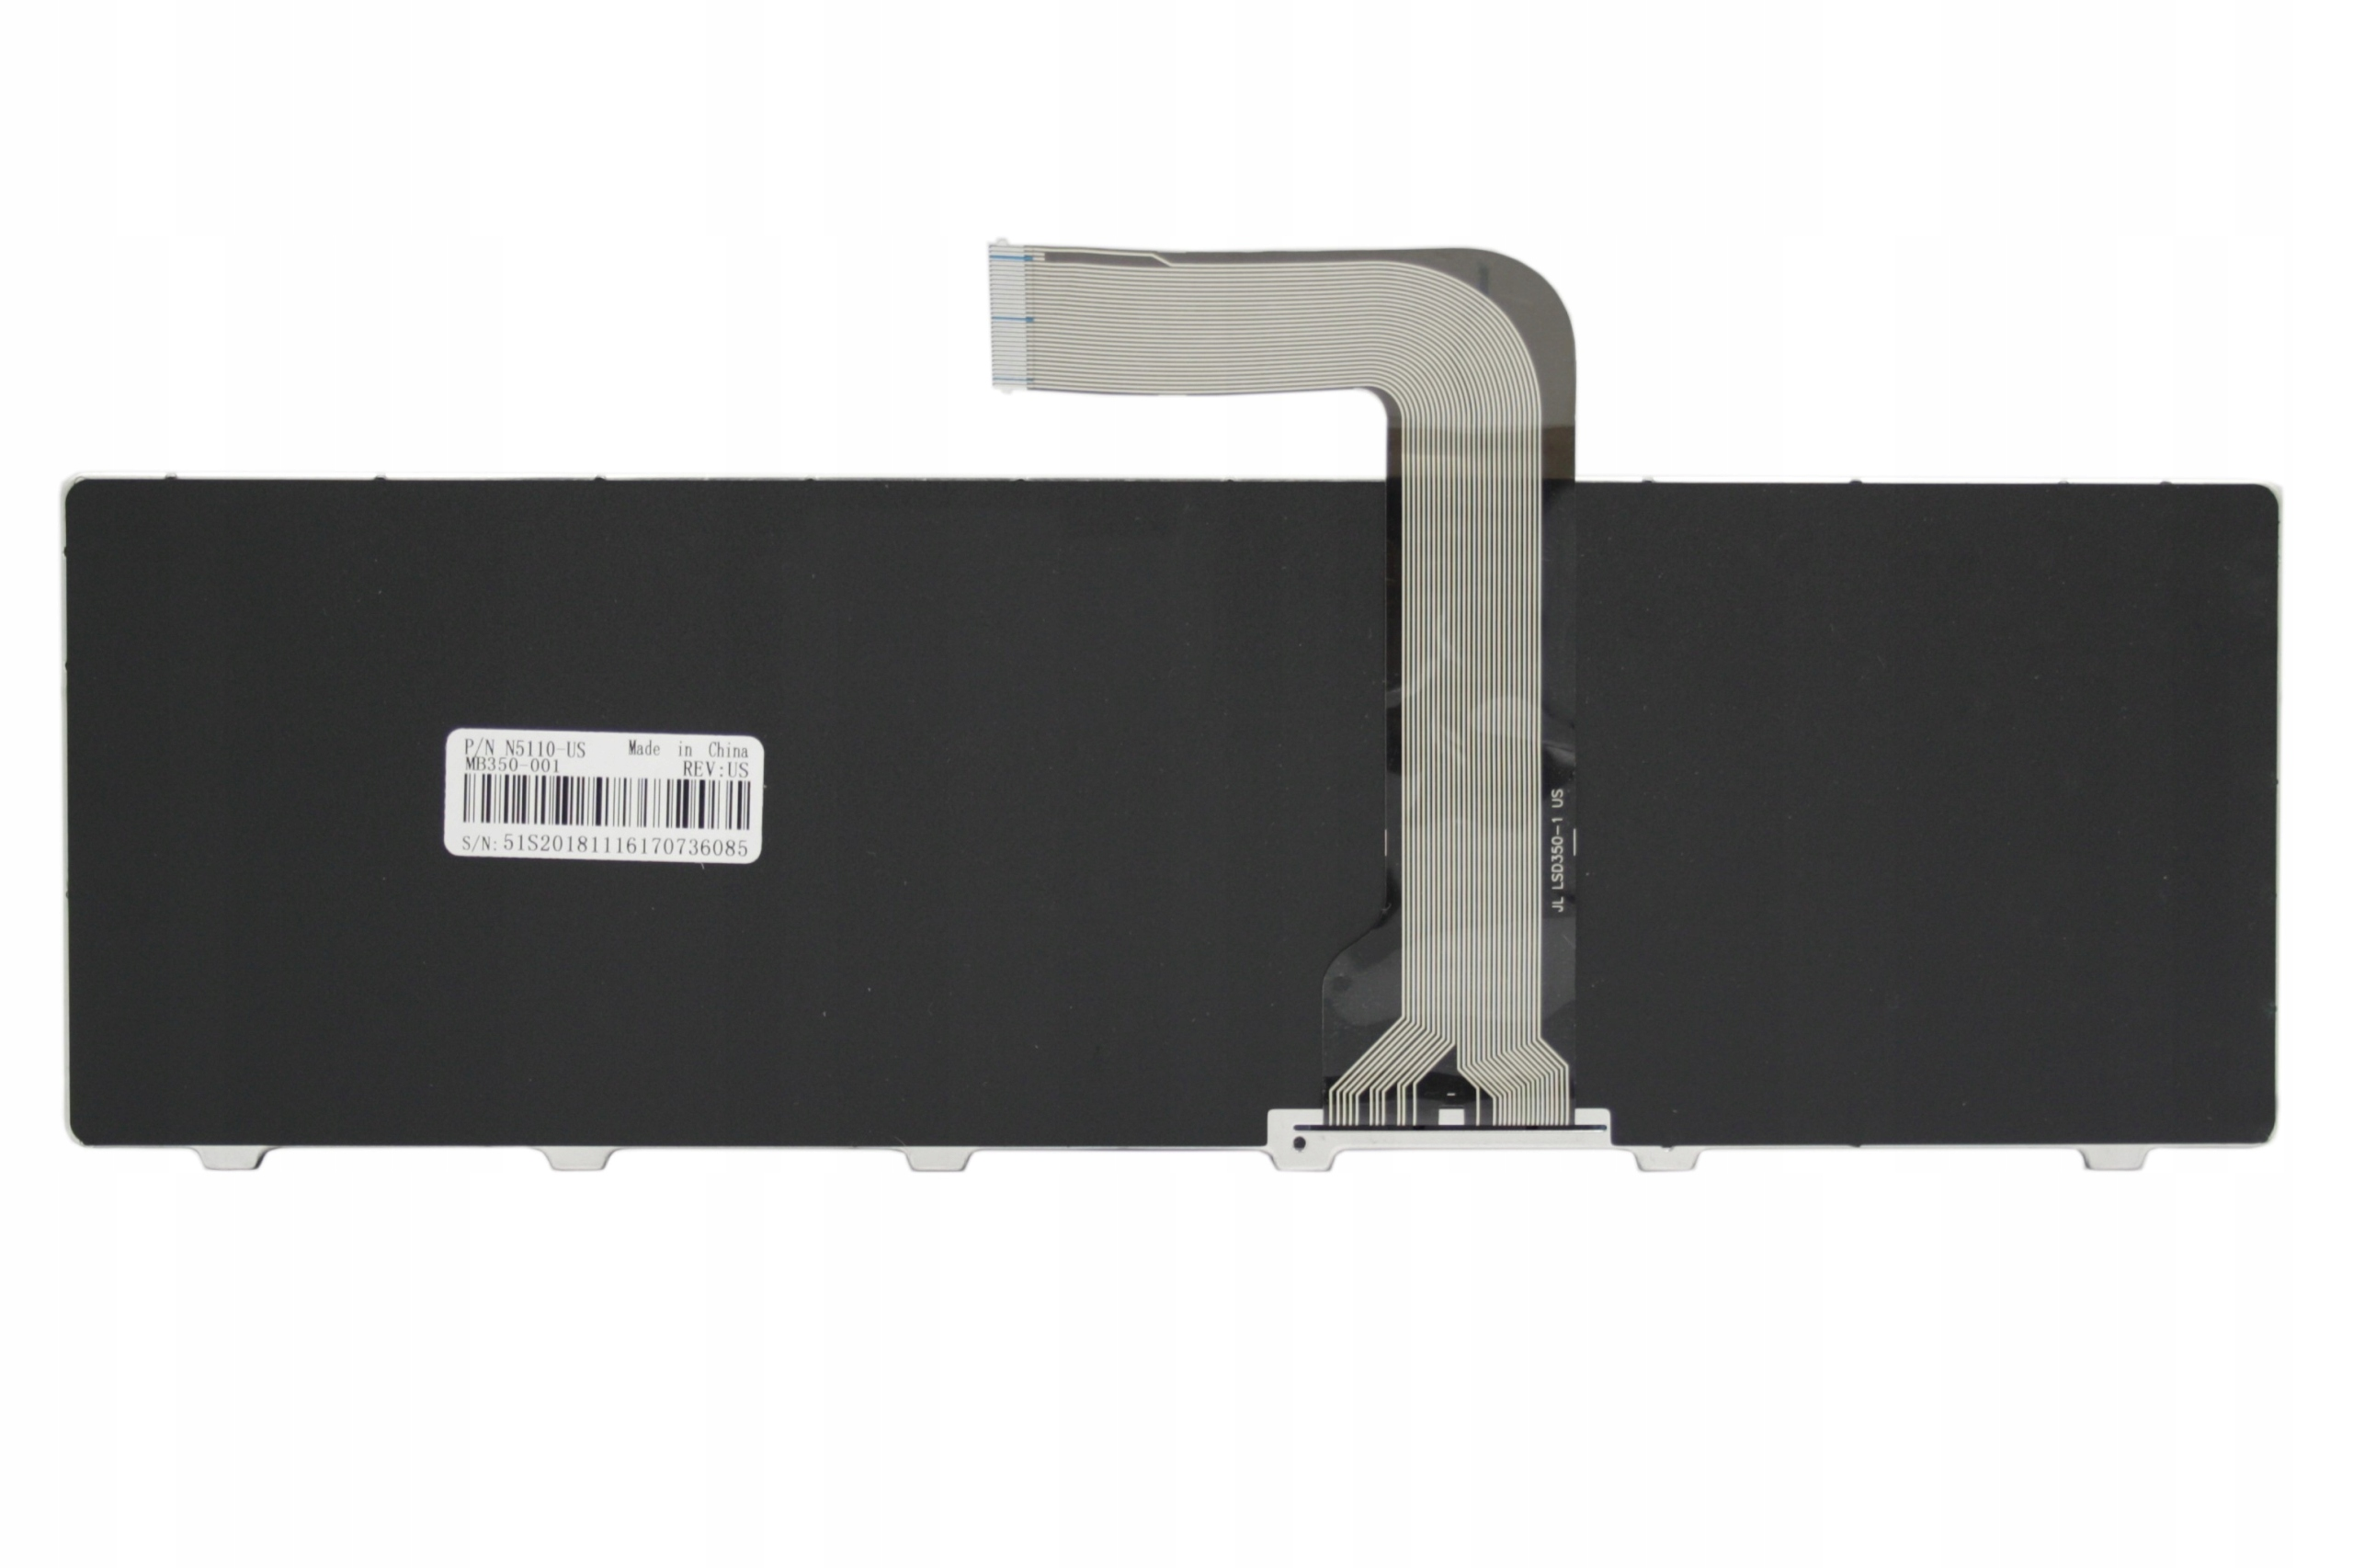 KLAWIATURA DELL INSPIRON 15R N5110 Q15R M5110 SE-5720 - Klawiatury do laptopów